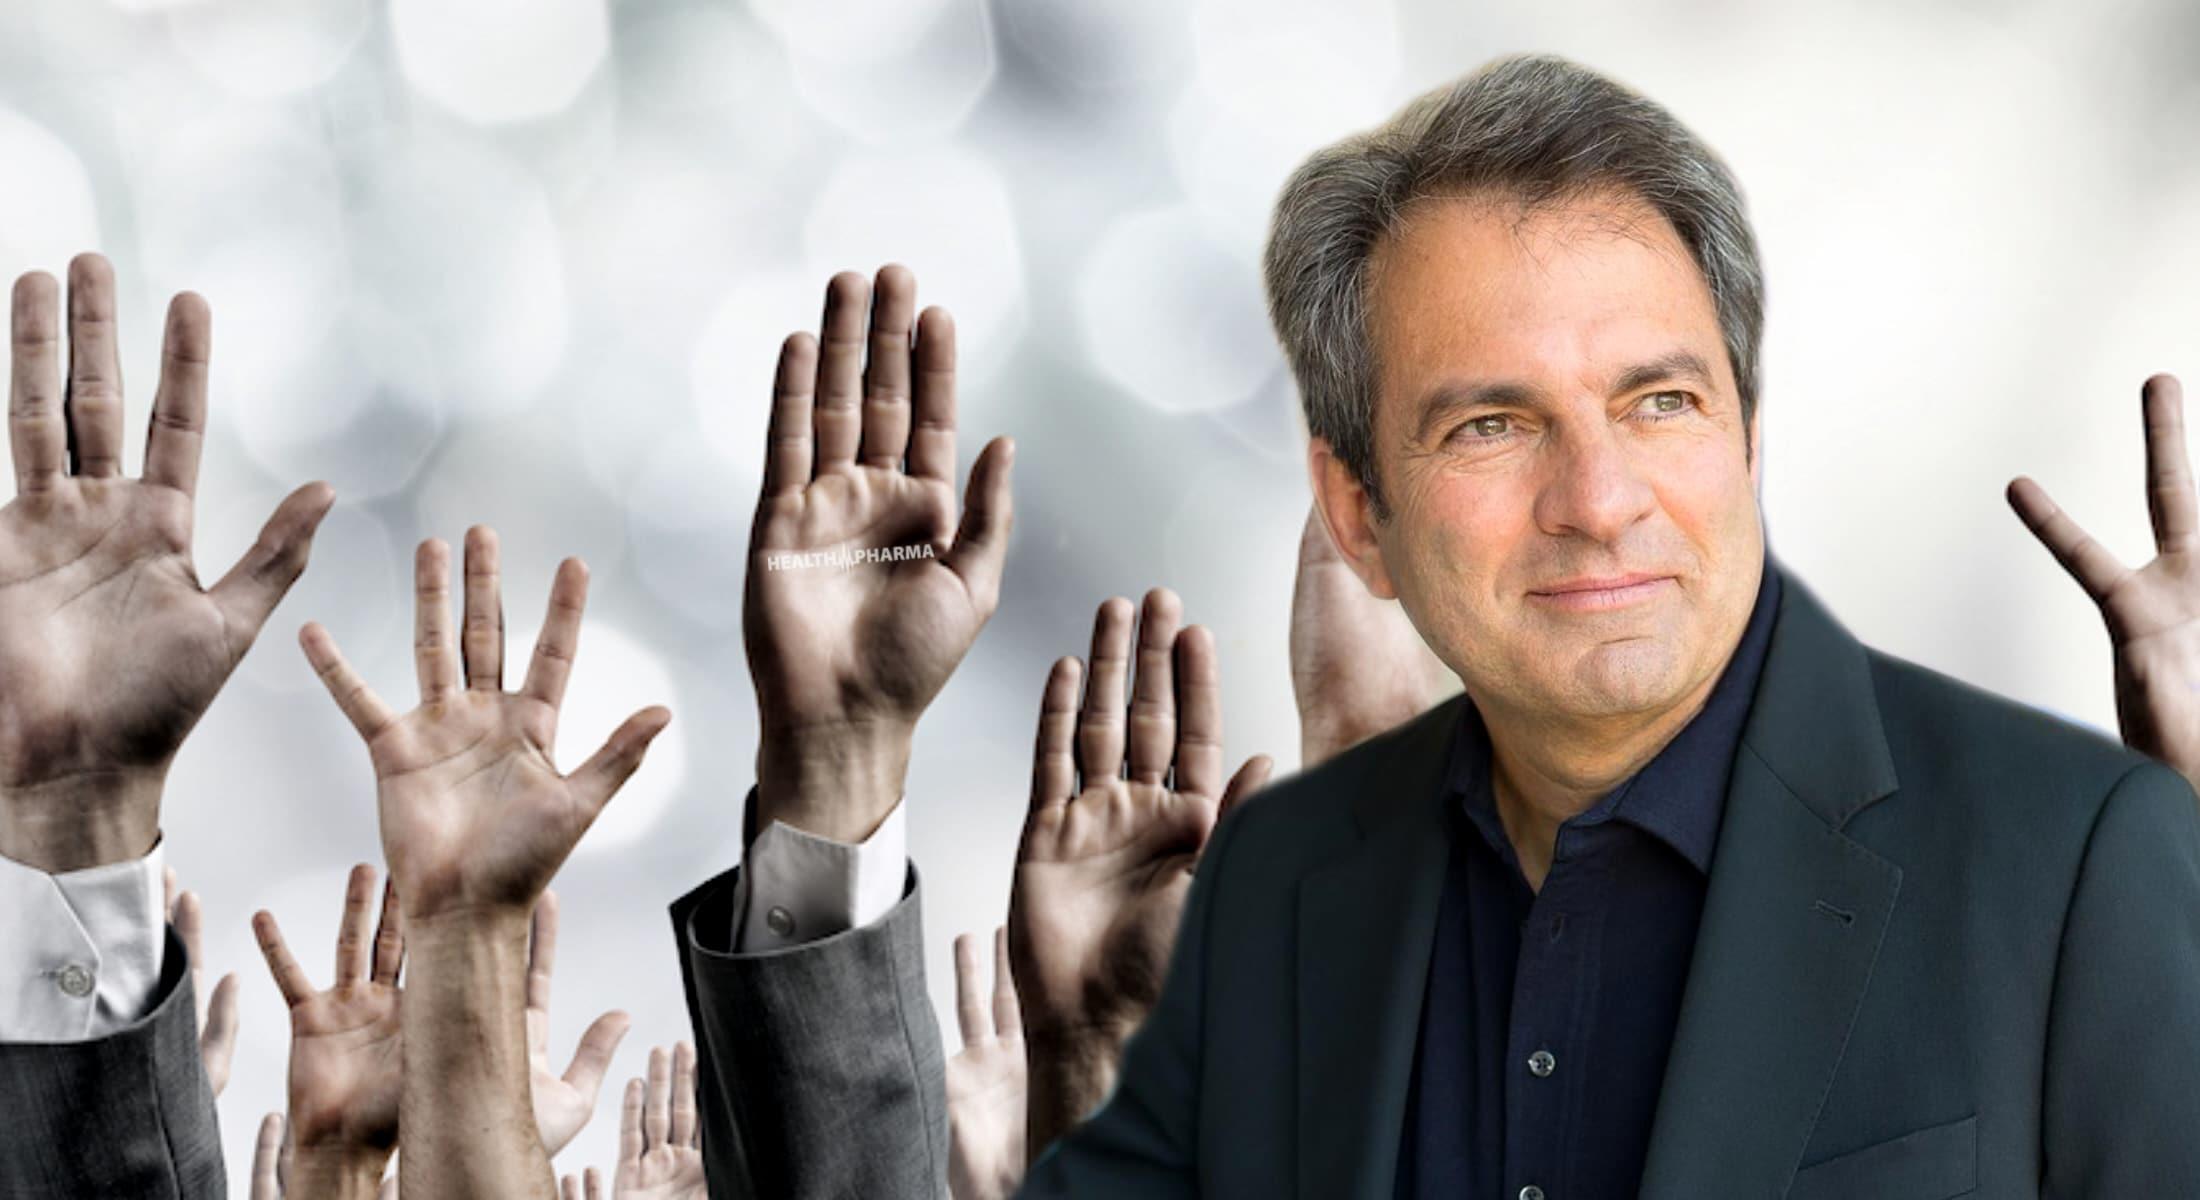 805c3fb0d9d Έλληνας ανάμεσα στους 20 υψηλότερα αμειβόμενους CEO της βιοτεχνολογίας